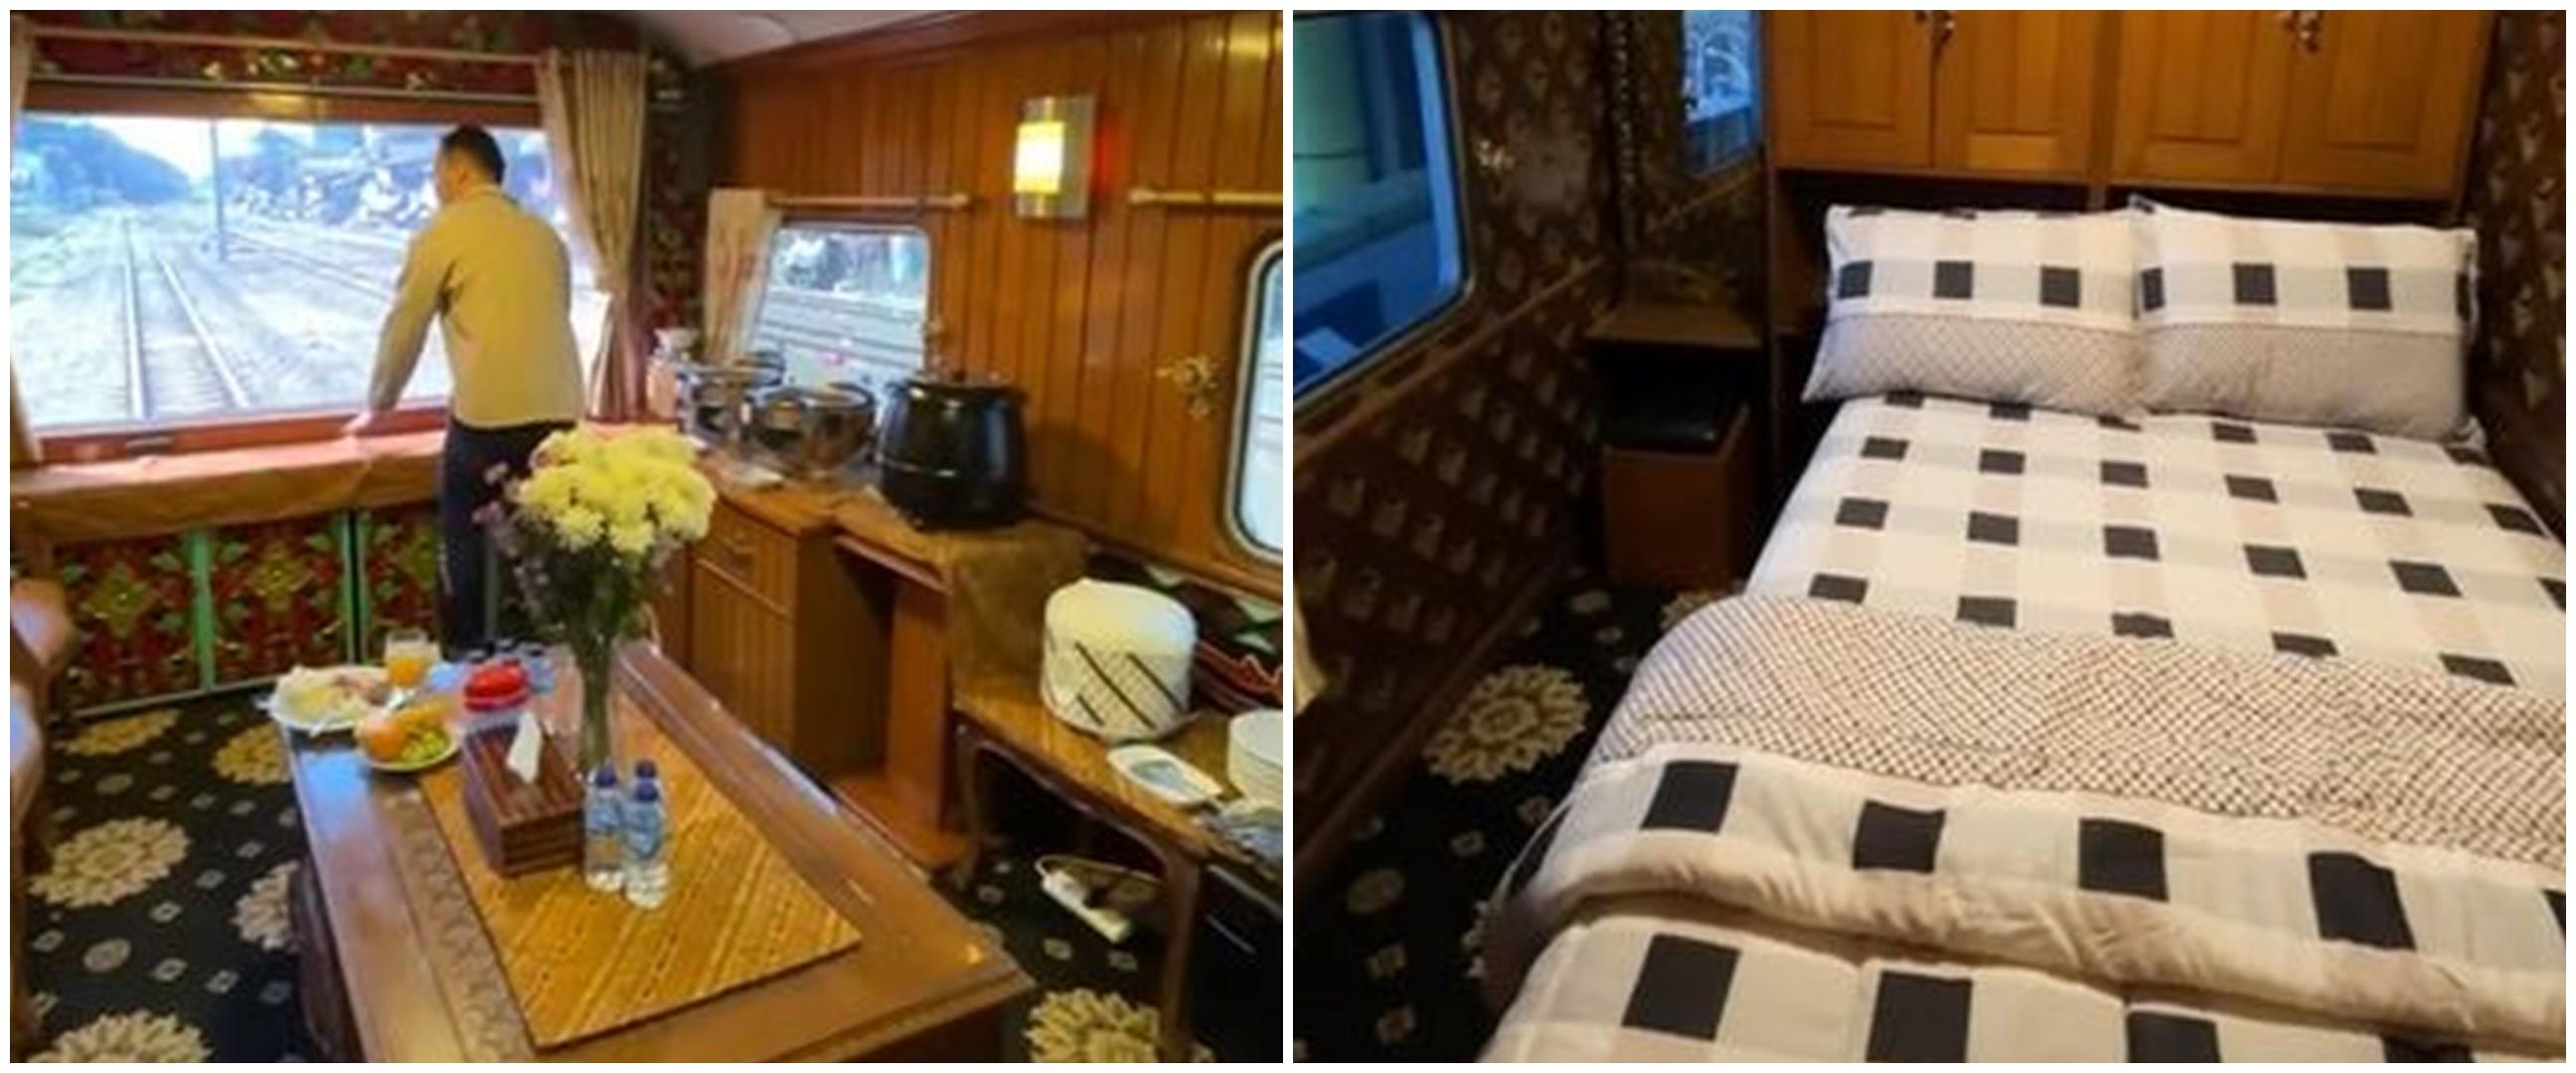 Pria beli tiket kereta Bandung-Yogyakarta Rp 25 juta, ini fasilitasnya